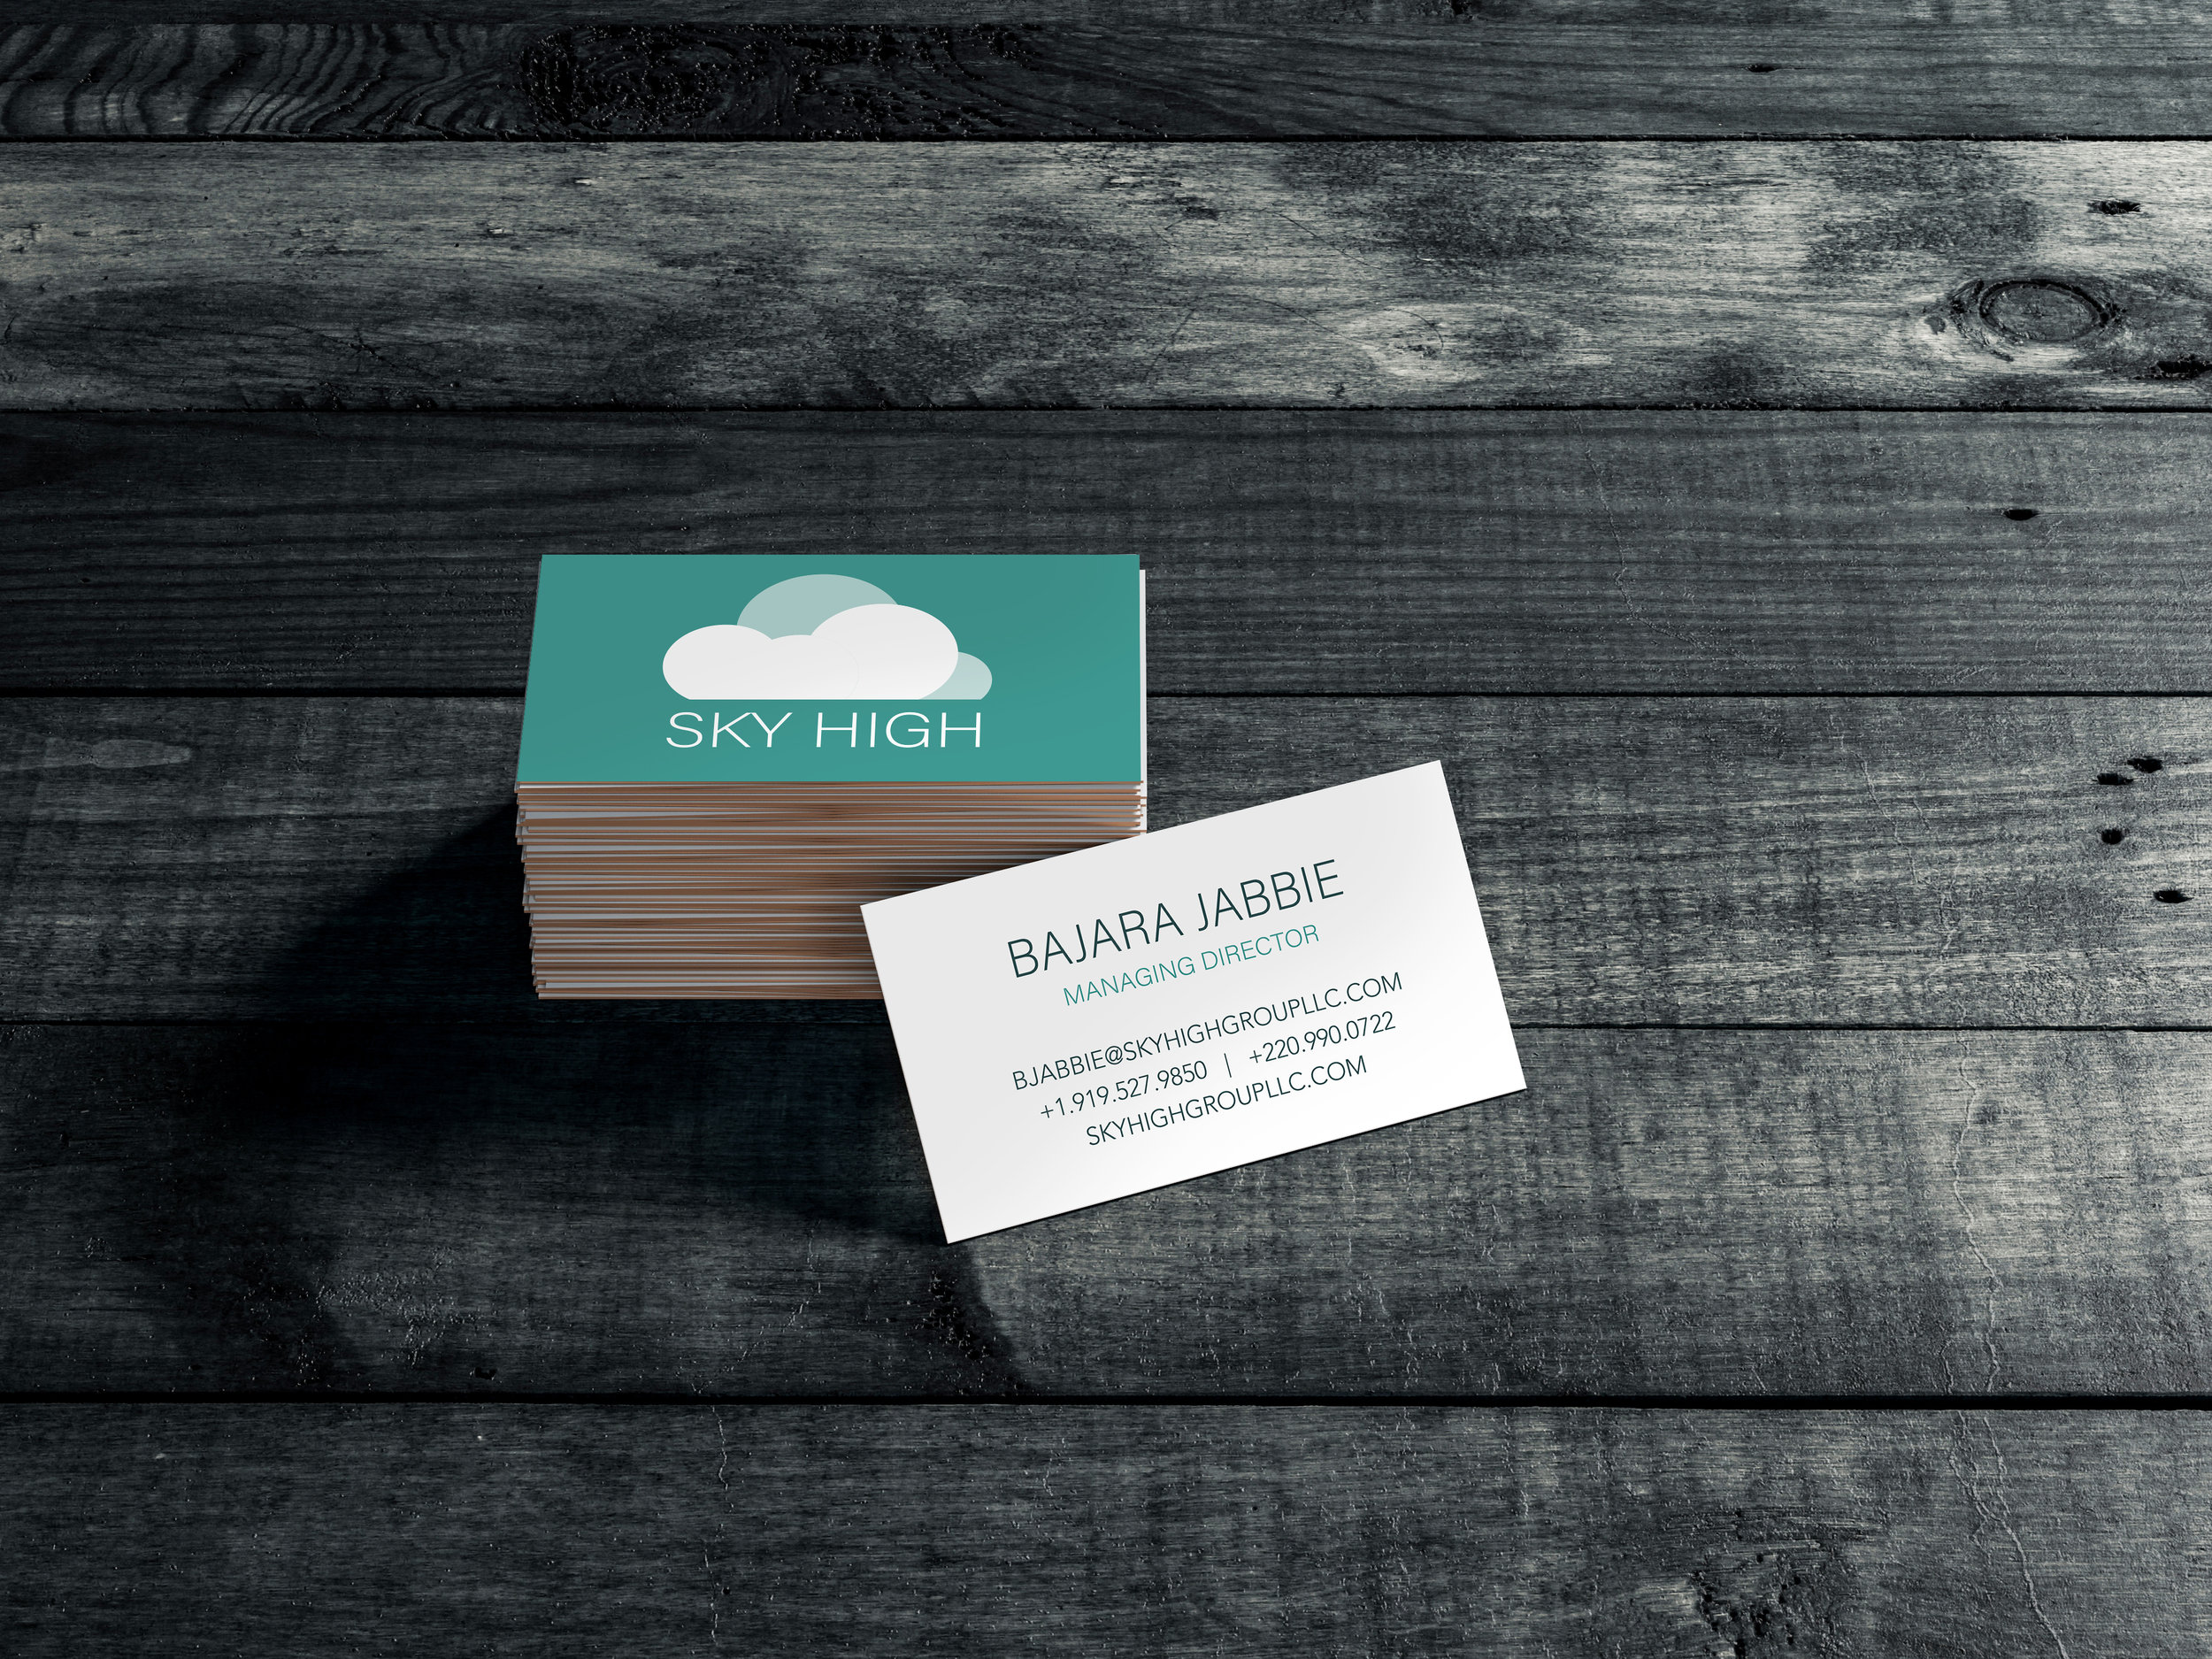 SHG business card mockup no logo.jpg